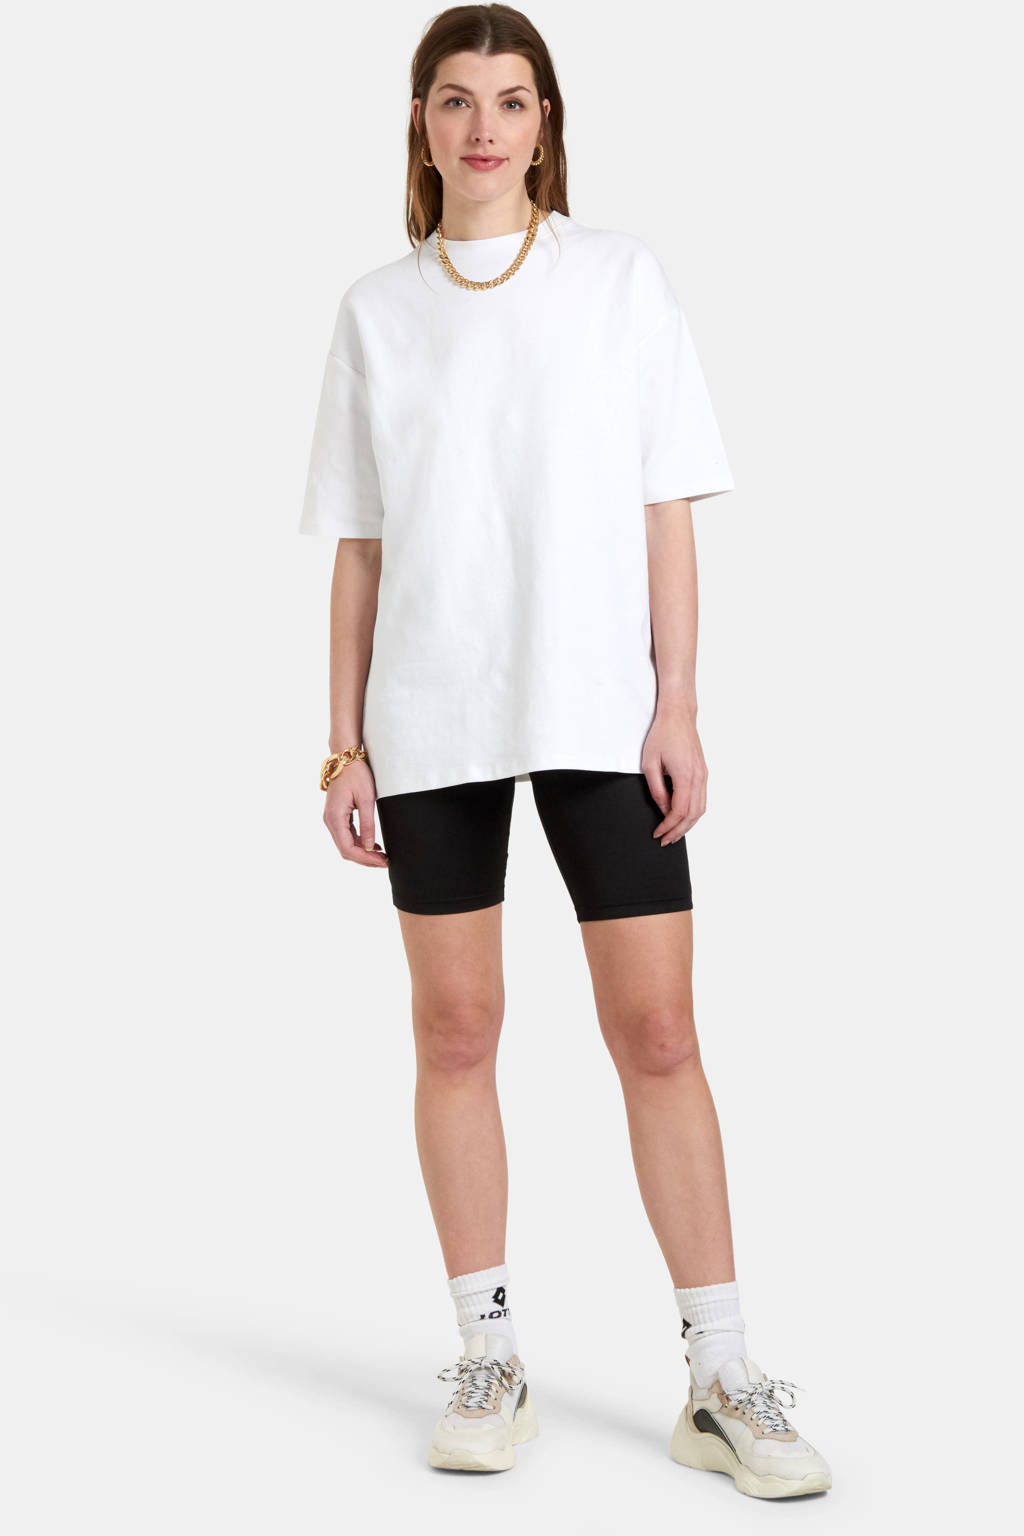 Eksept by Shoeby T-shirt Arky wit oversized fit, Wit